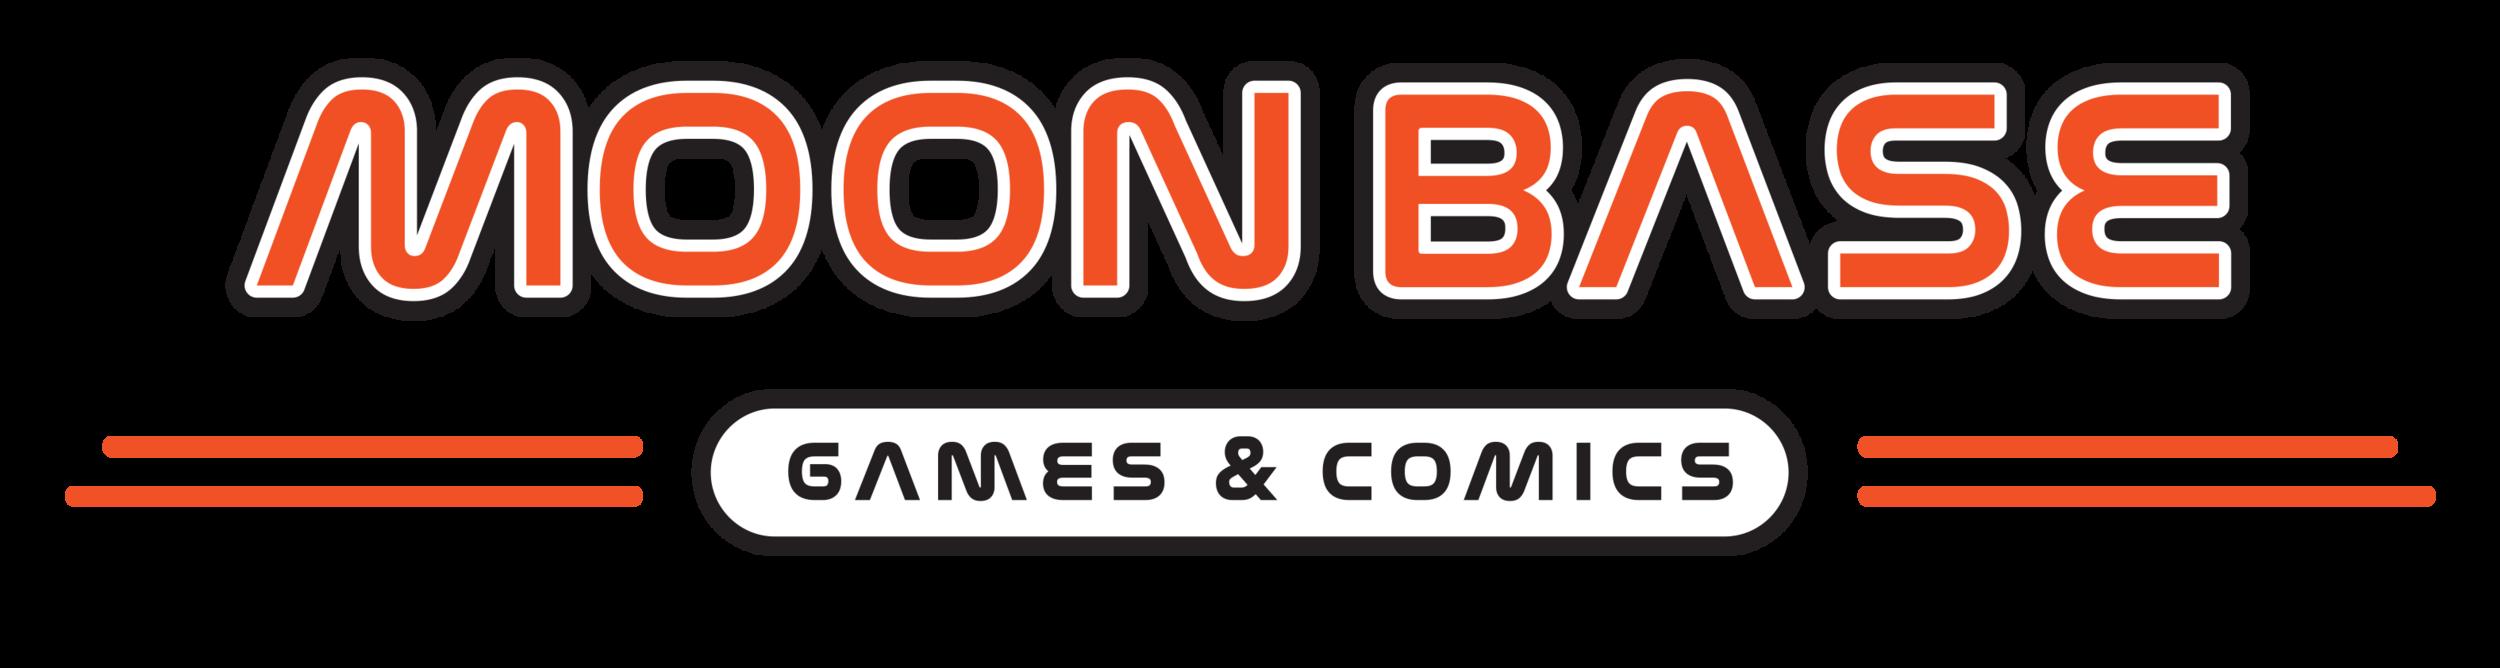 z-moon-base-logo-horizontal.png